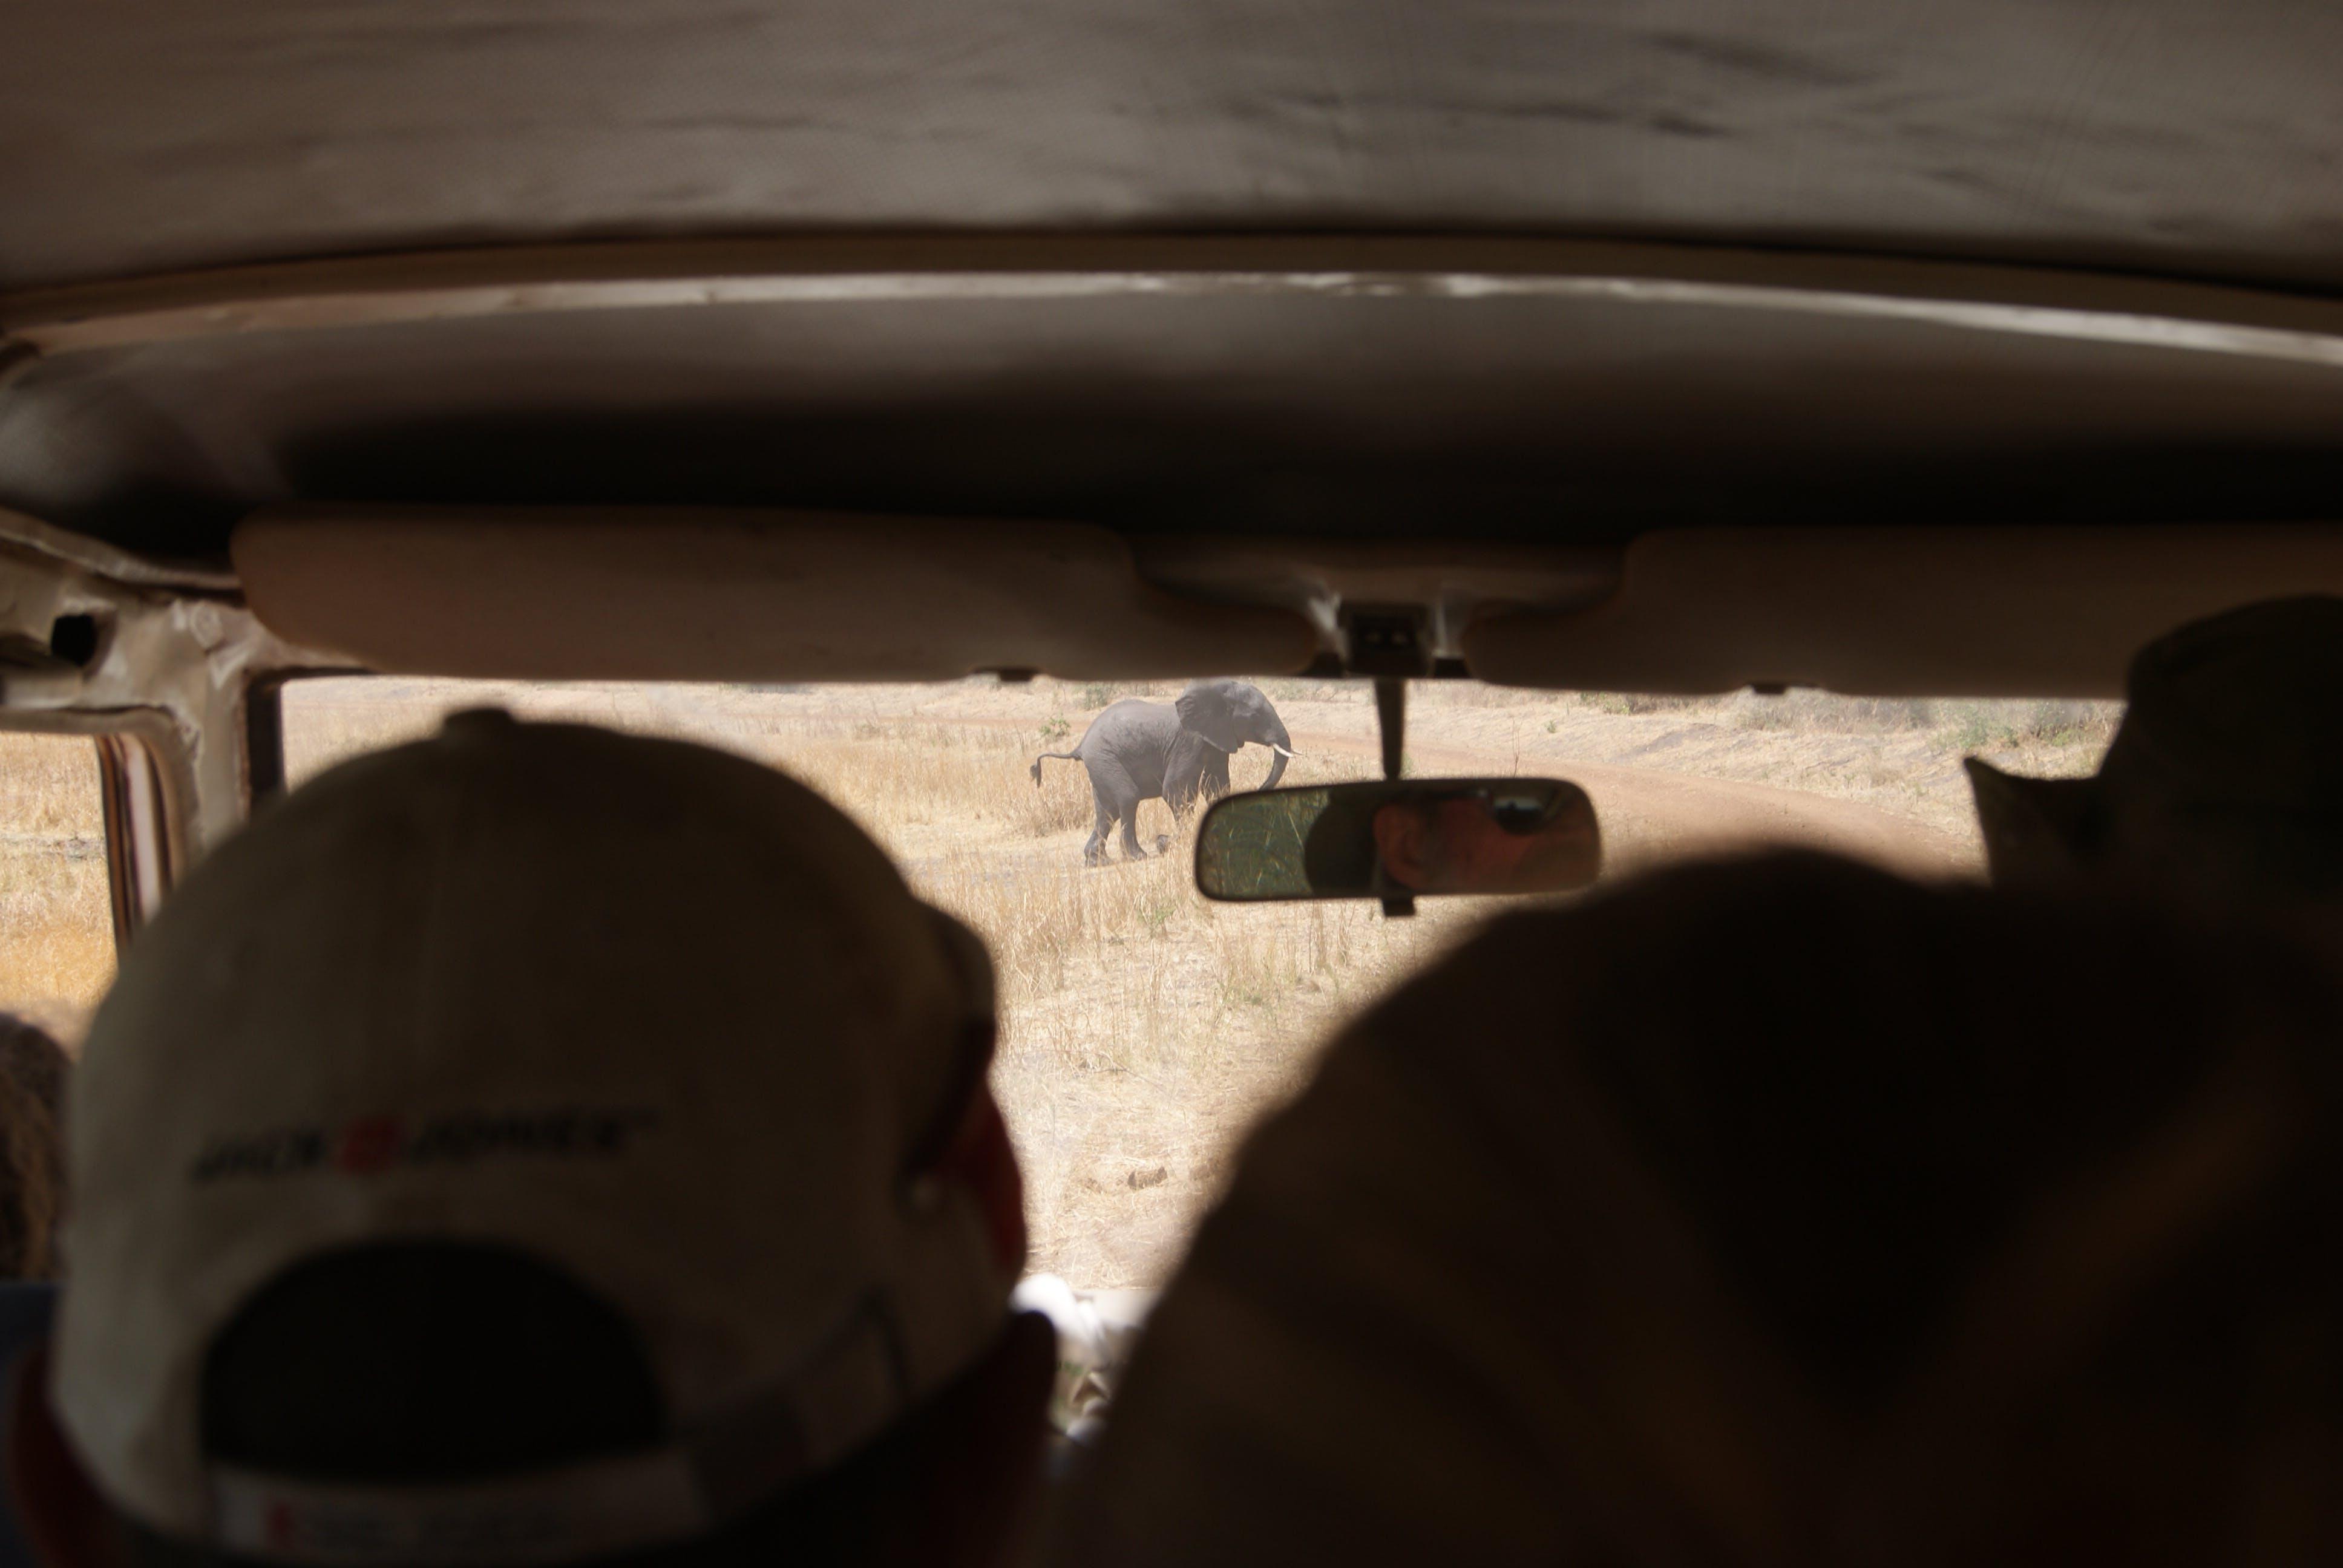 Free stock photo of car, elephant, inside car, rearview mirror